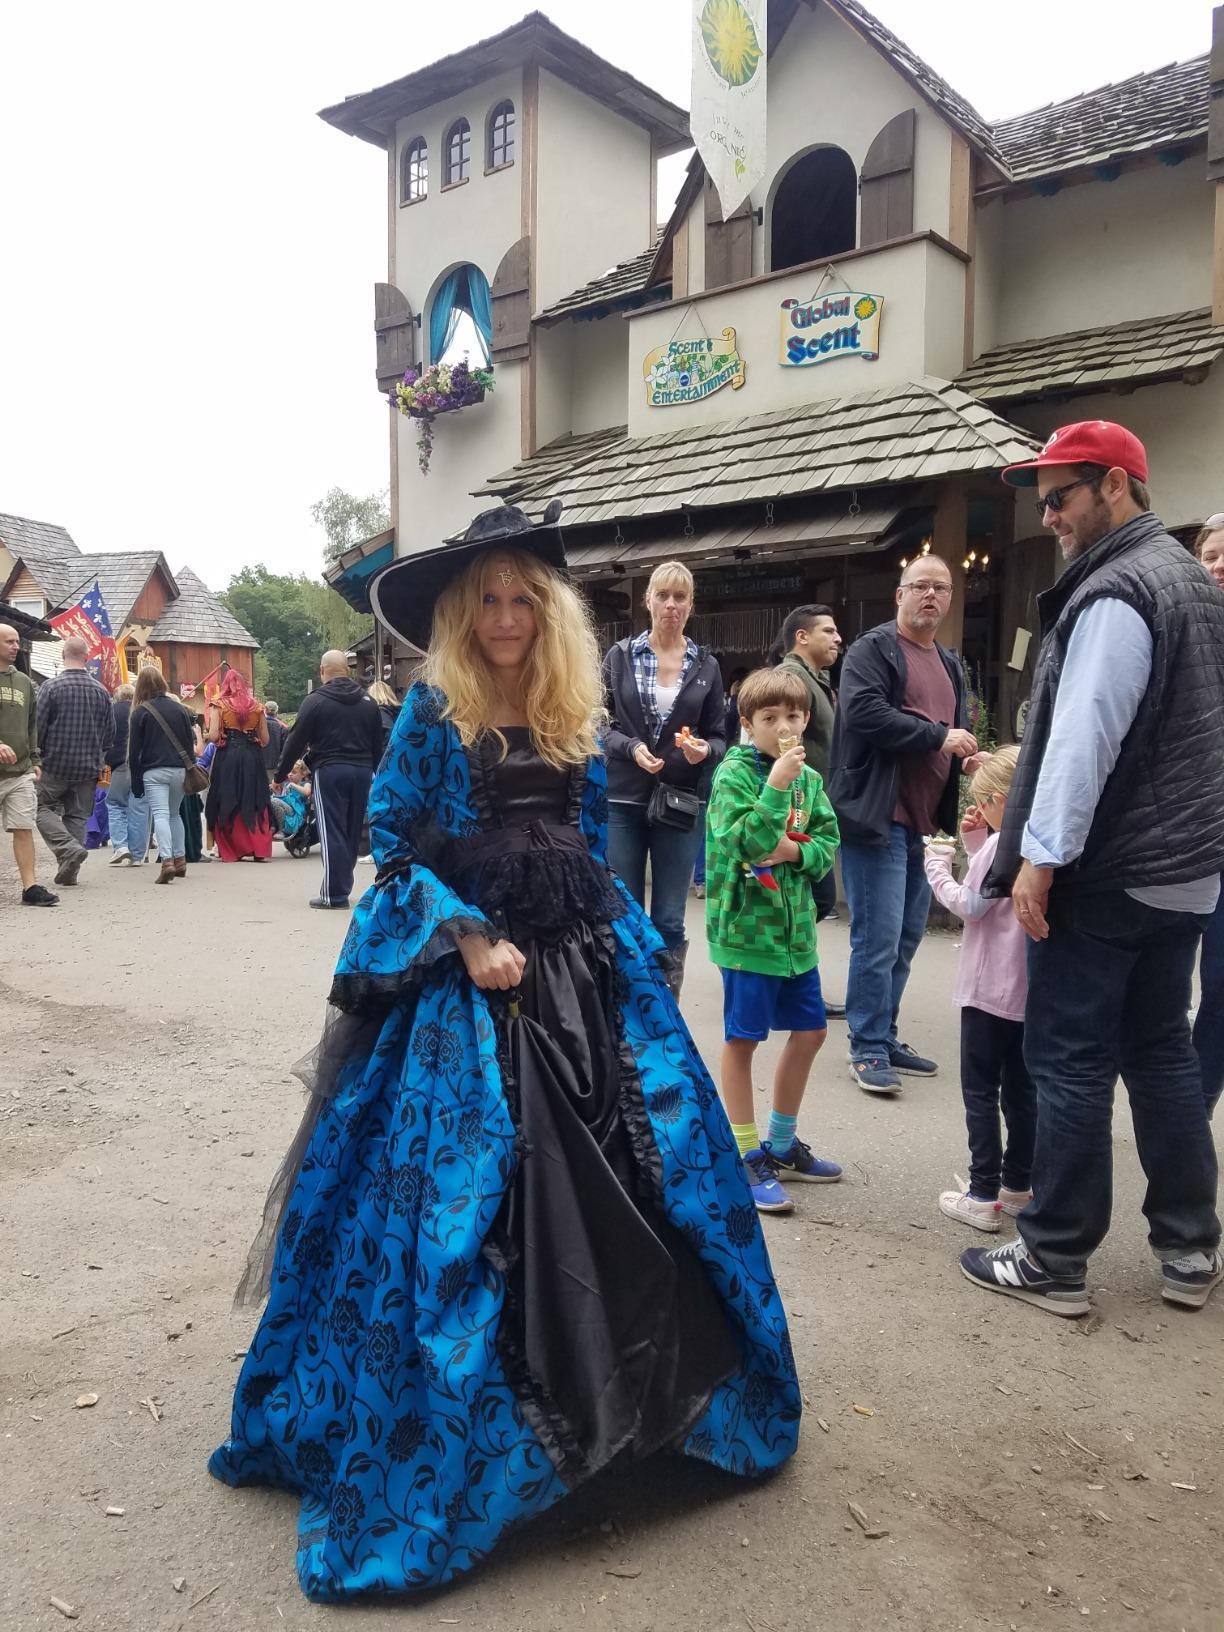 www.wholesalelolita.com/georgian-victorian-gothic-period-dress-masquerade-ball-gown-reenactment-theatre-costume-blue-p-15988.html